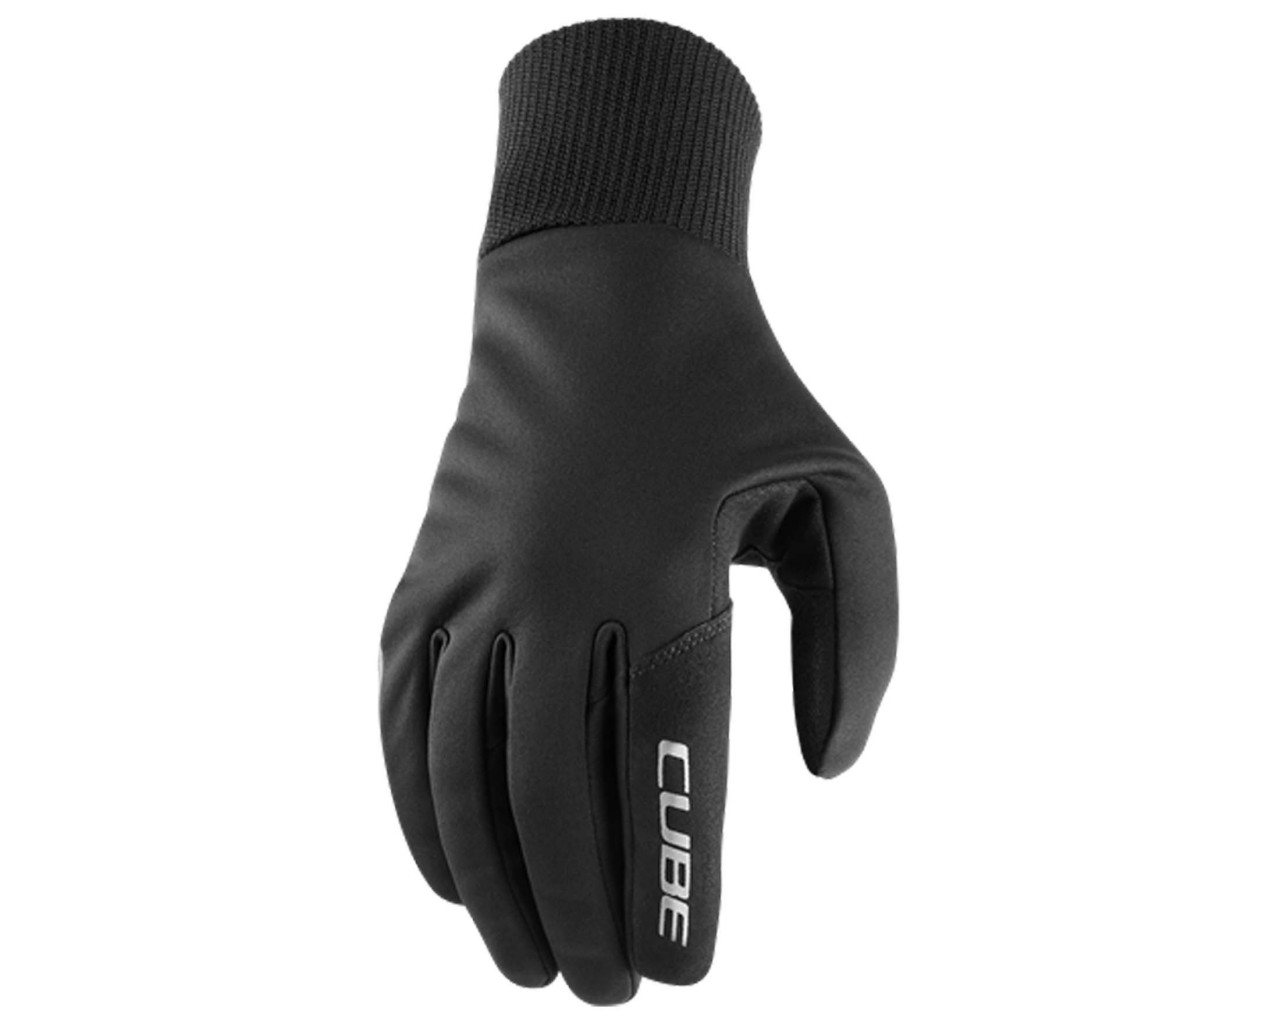 Cube Handschuhe Performance All Season langfinger | black